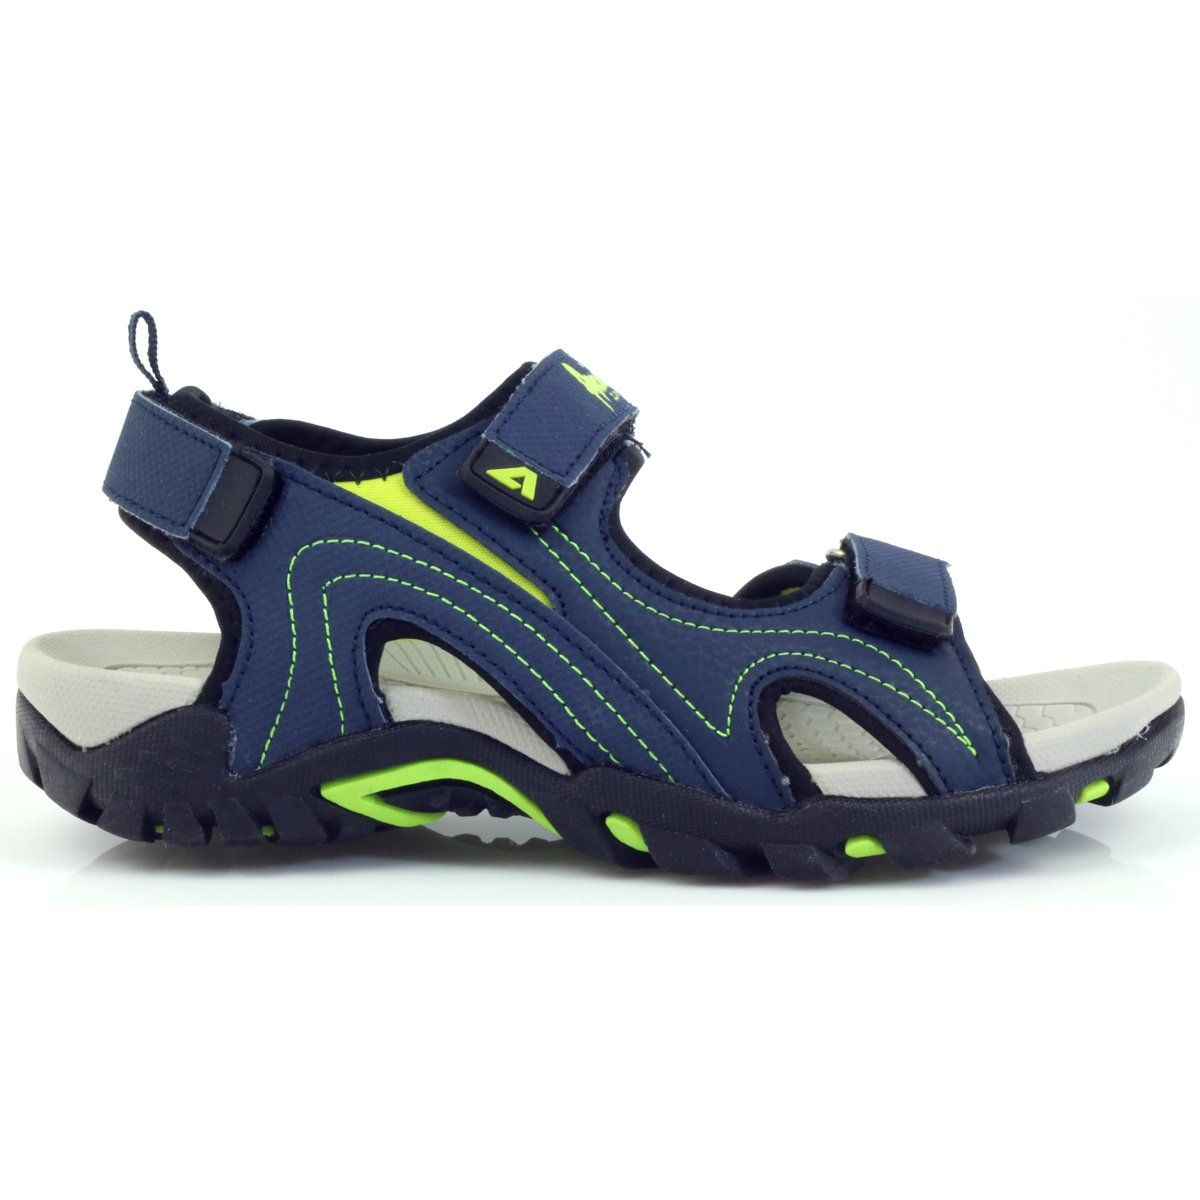 American Club American Sandaly Buty Dzieciece Wkladka Piankowa Granatowe Shoes Mens Shoes Sneakers